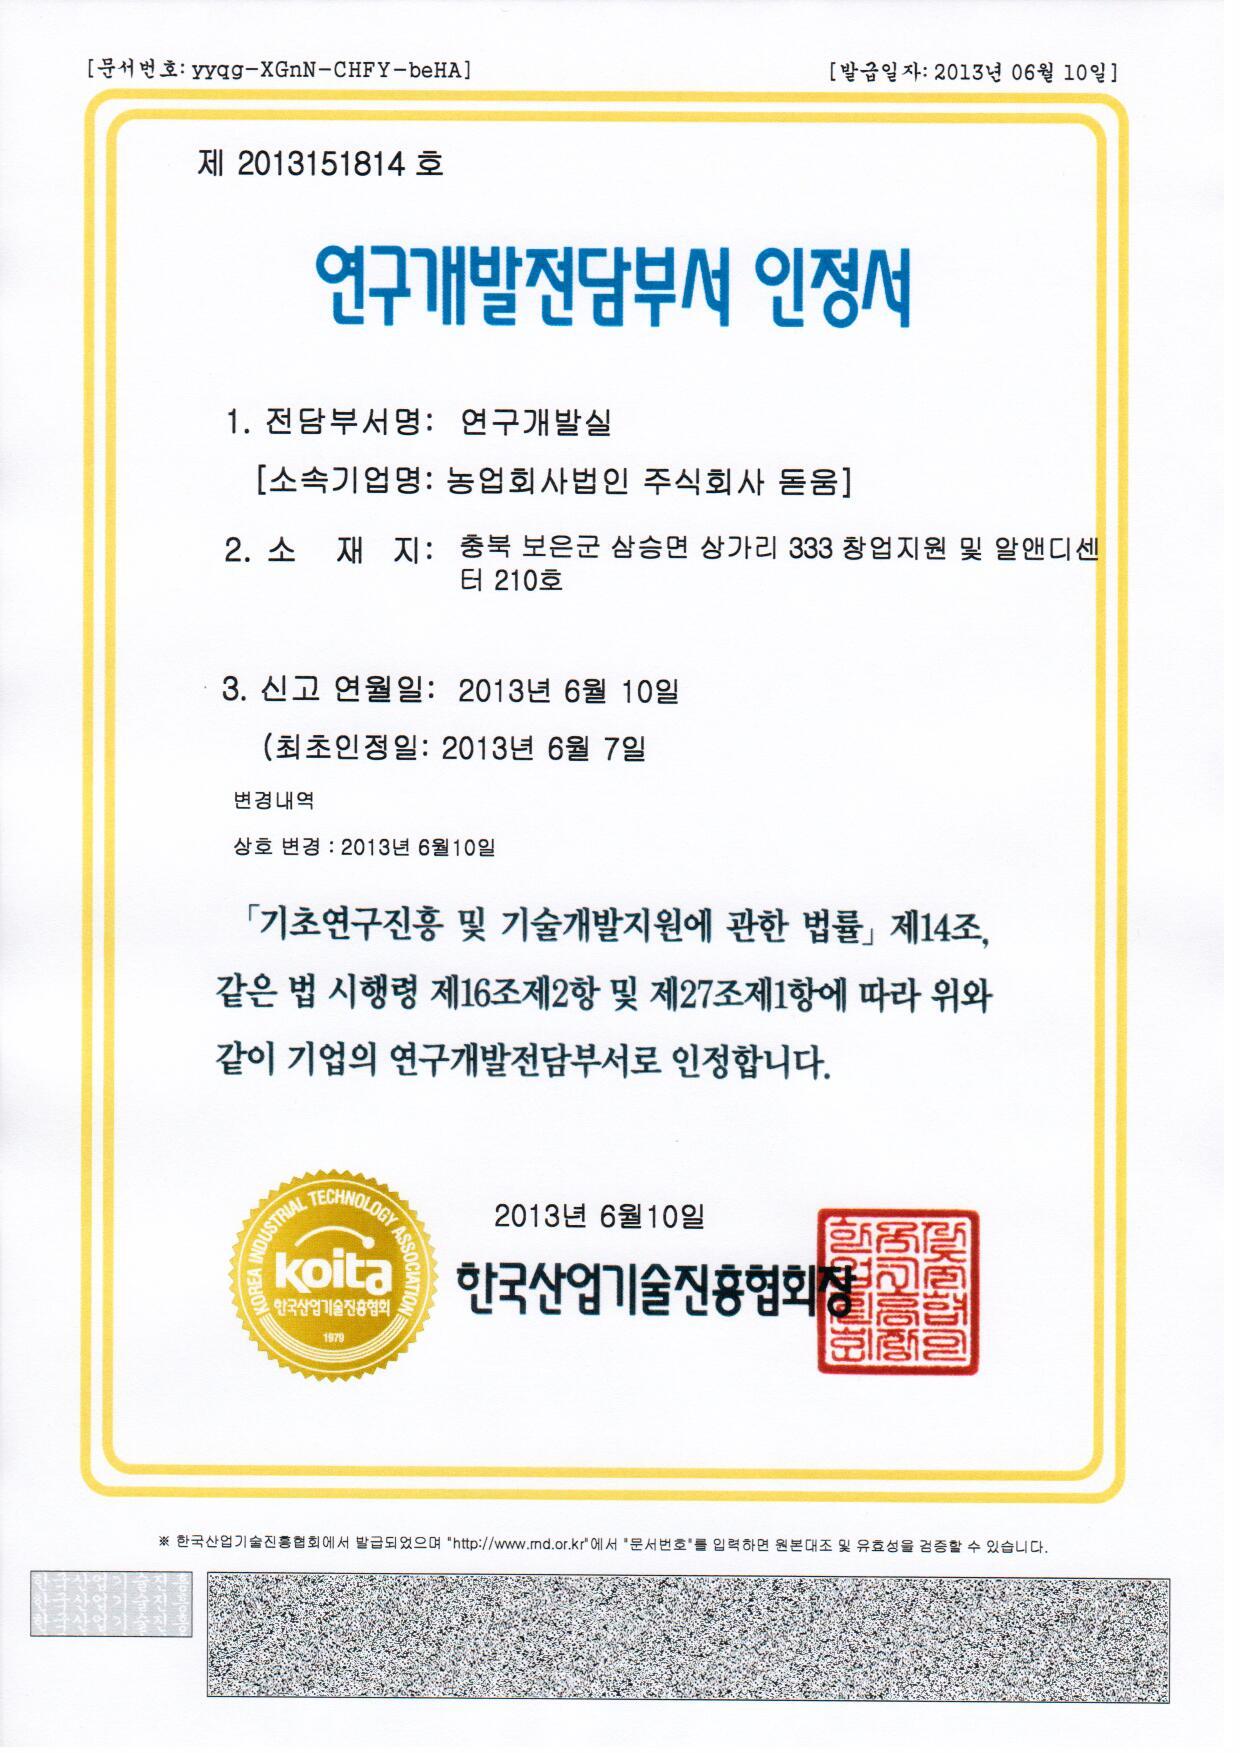 Certificate of R & D department